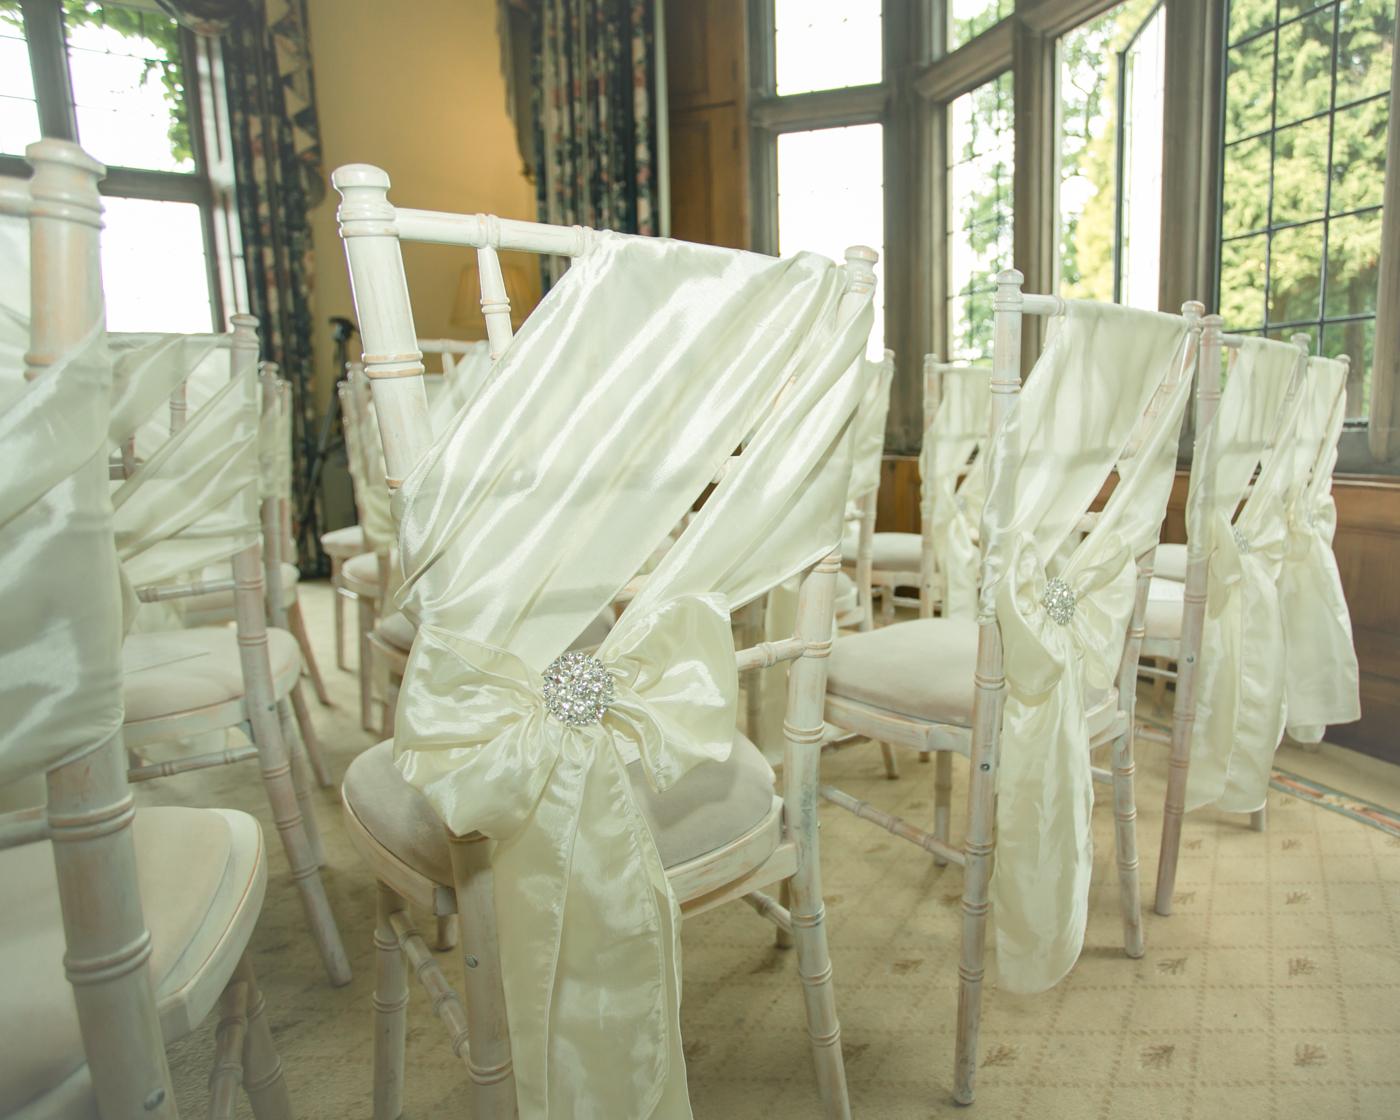 024 - Marie and Richards Fine Art Wedding Photography at Callow Hall by Pamela and Mark Pugh Team MP - www.mpmedia.co.uk -652.JPG